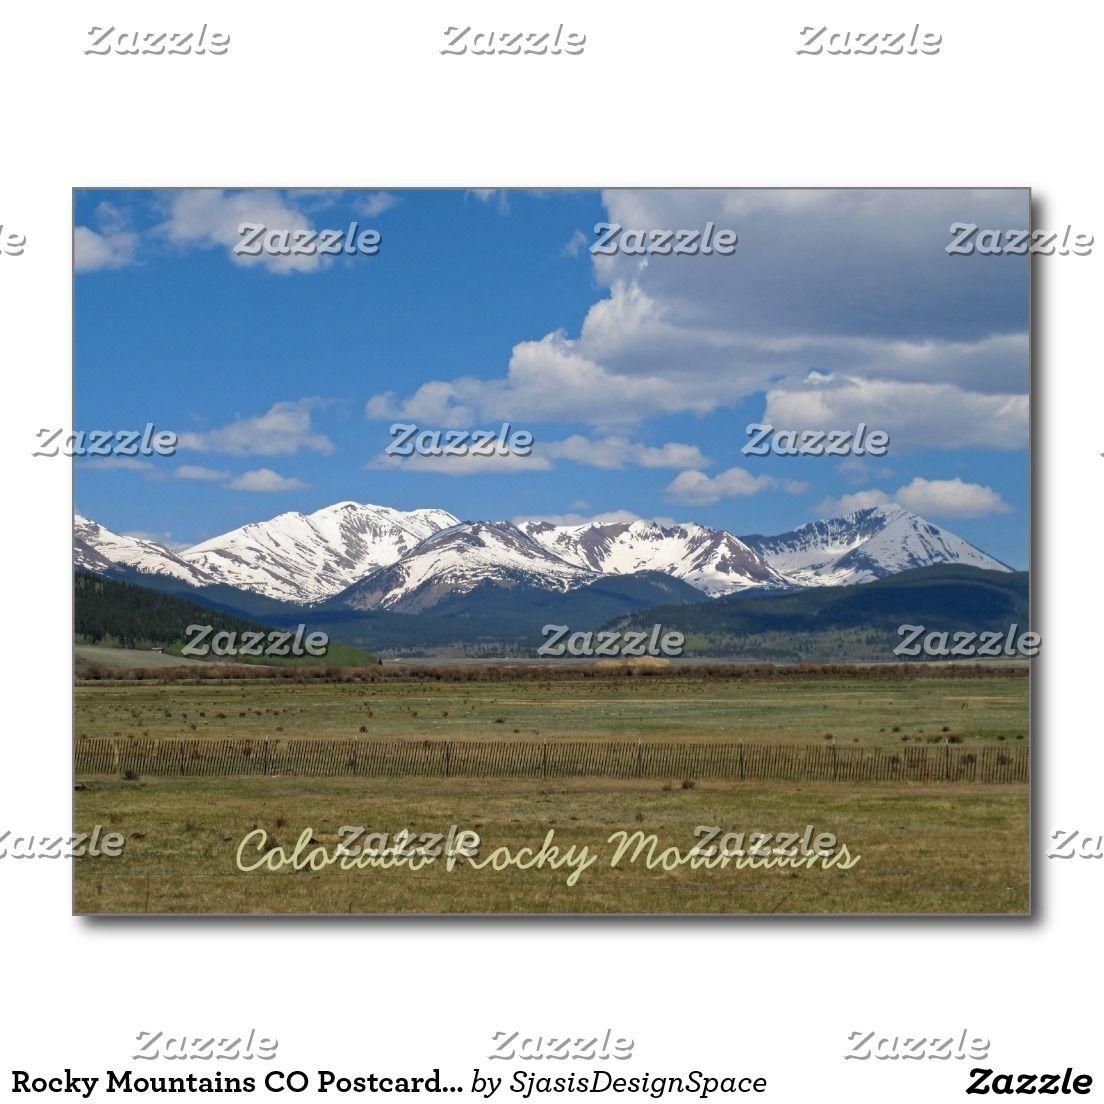 Rocky Mountains CO Postcard with 2017 Calendar